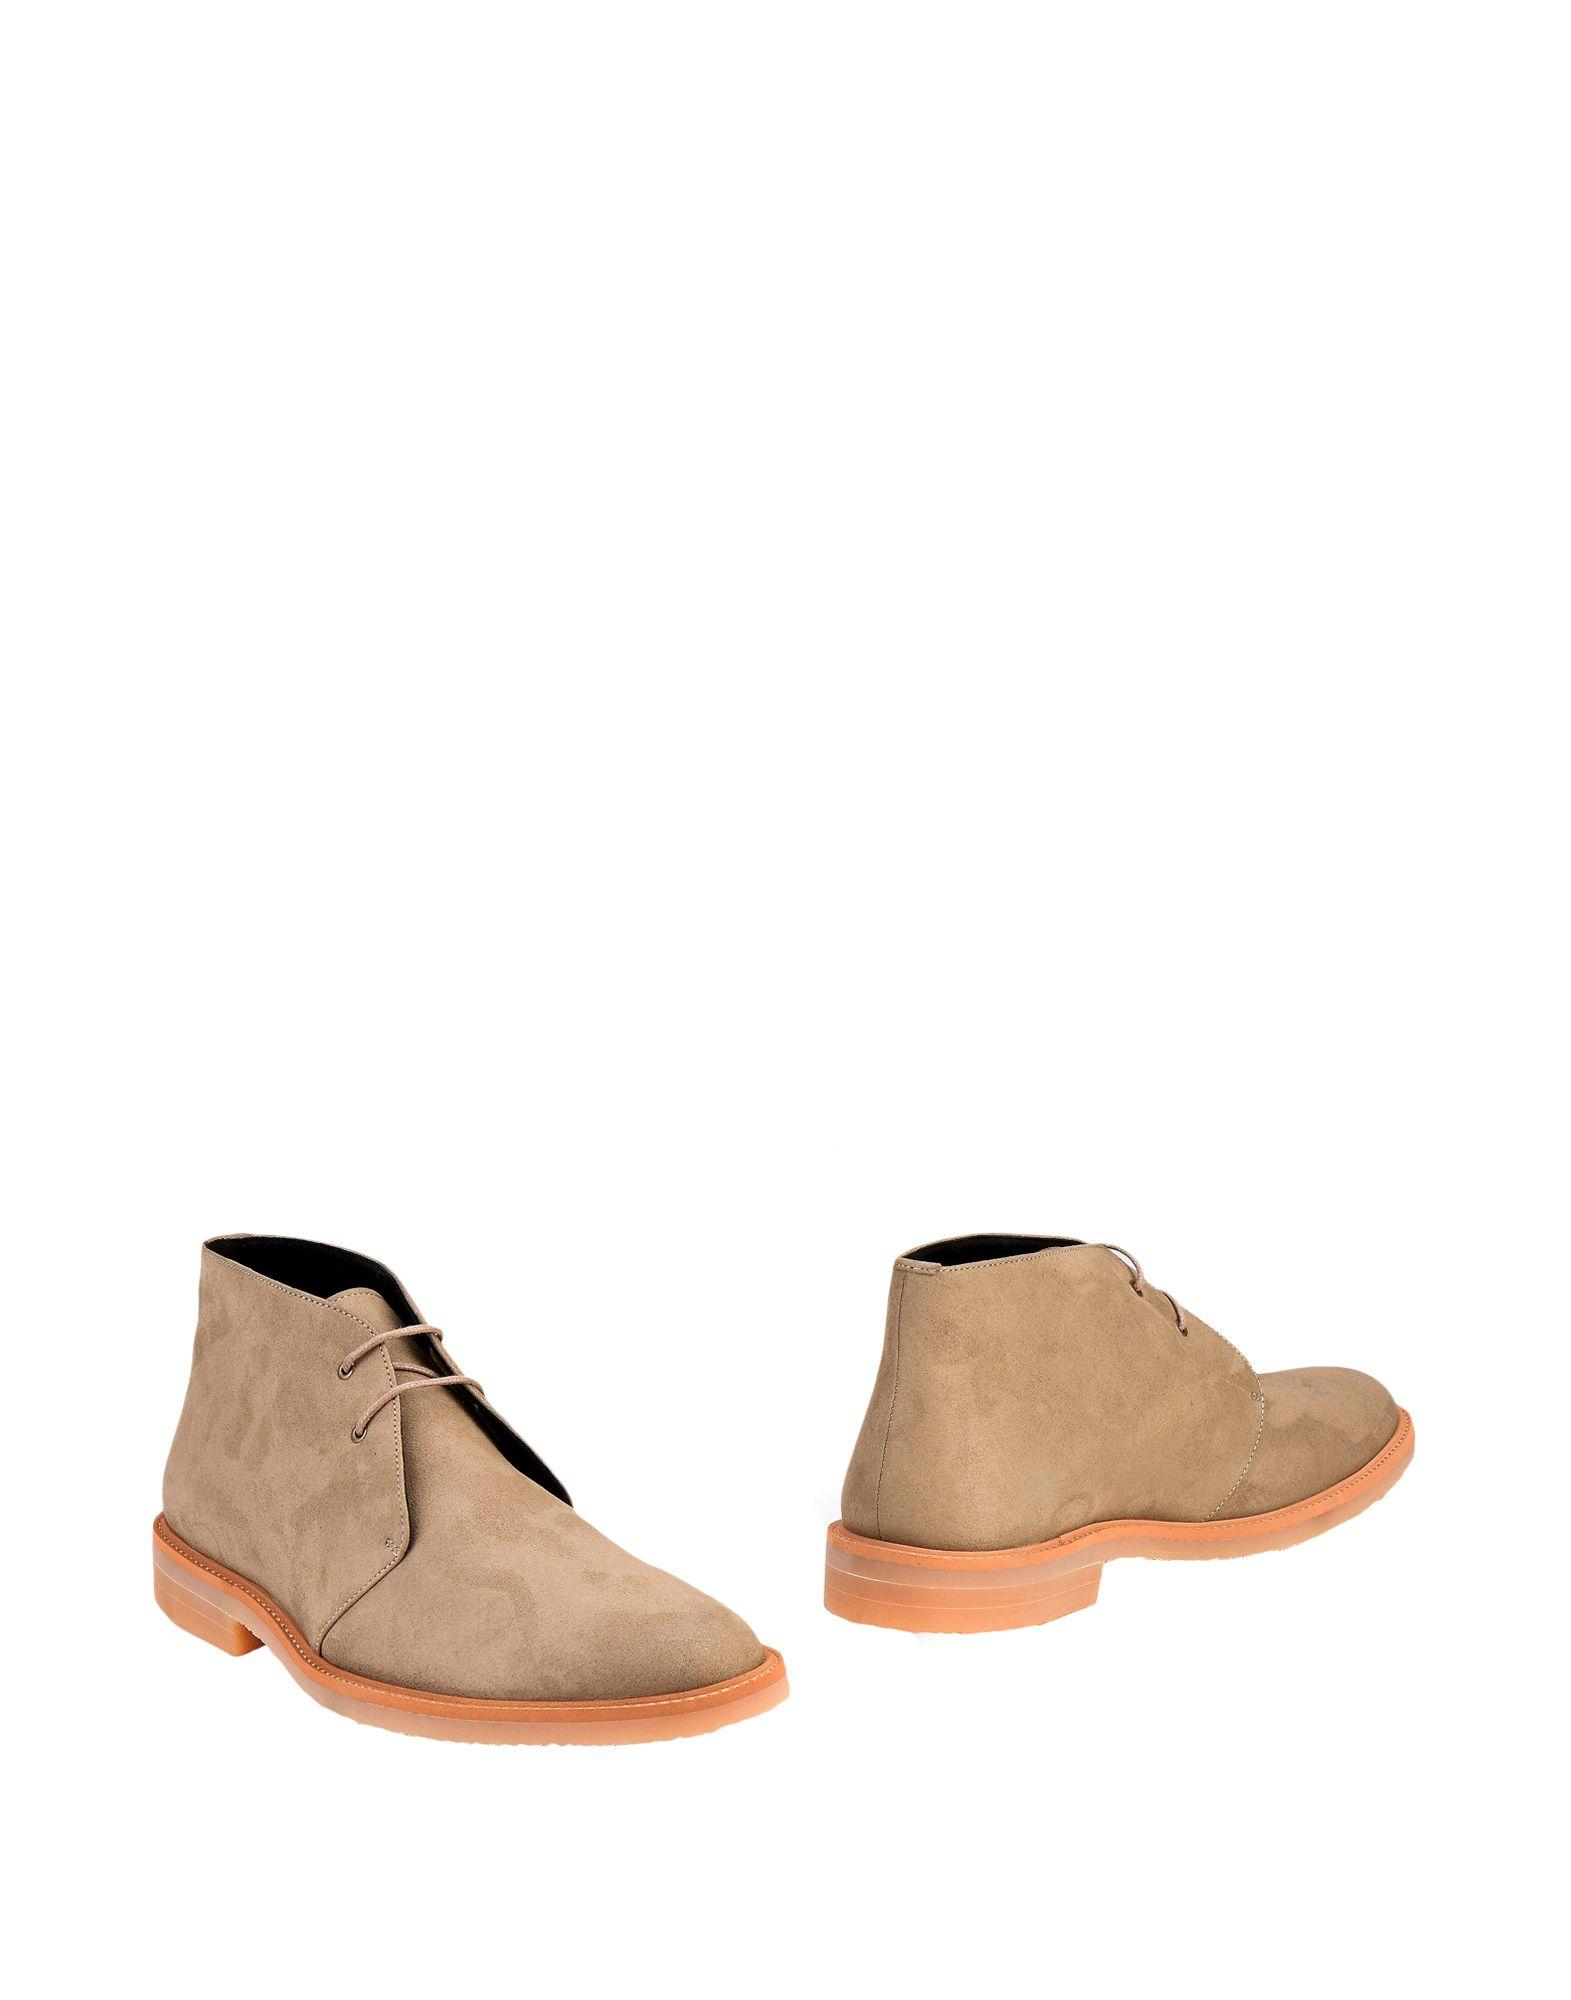 Brave Gentleman Boots Boots - Men Brave Gentleman Boots Boots online on  Australia - 11398953XK 682f3f